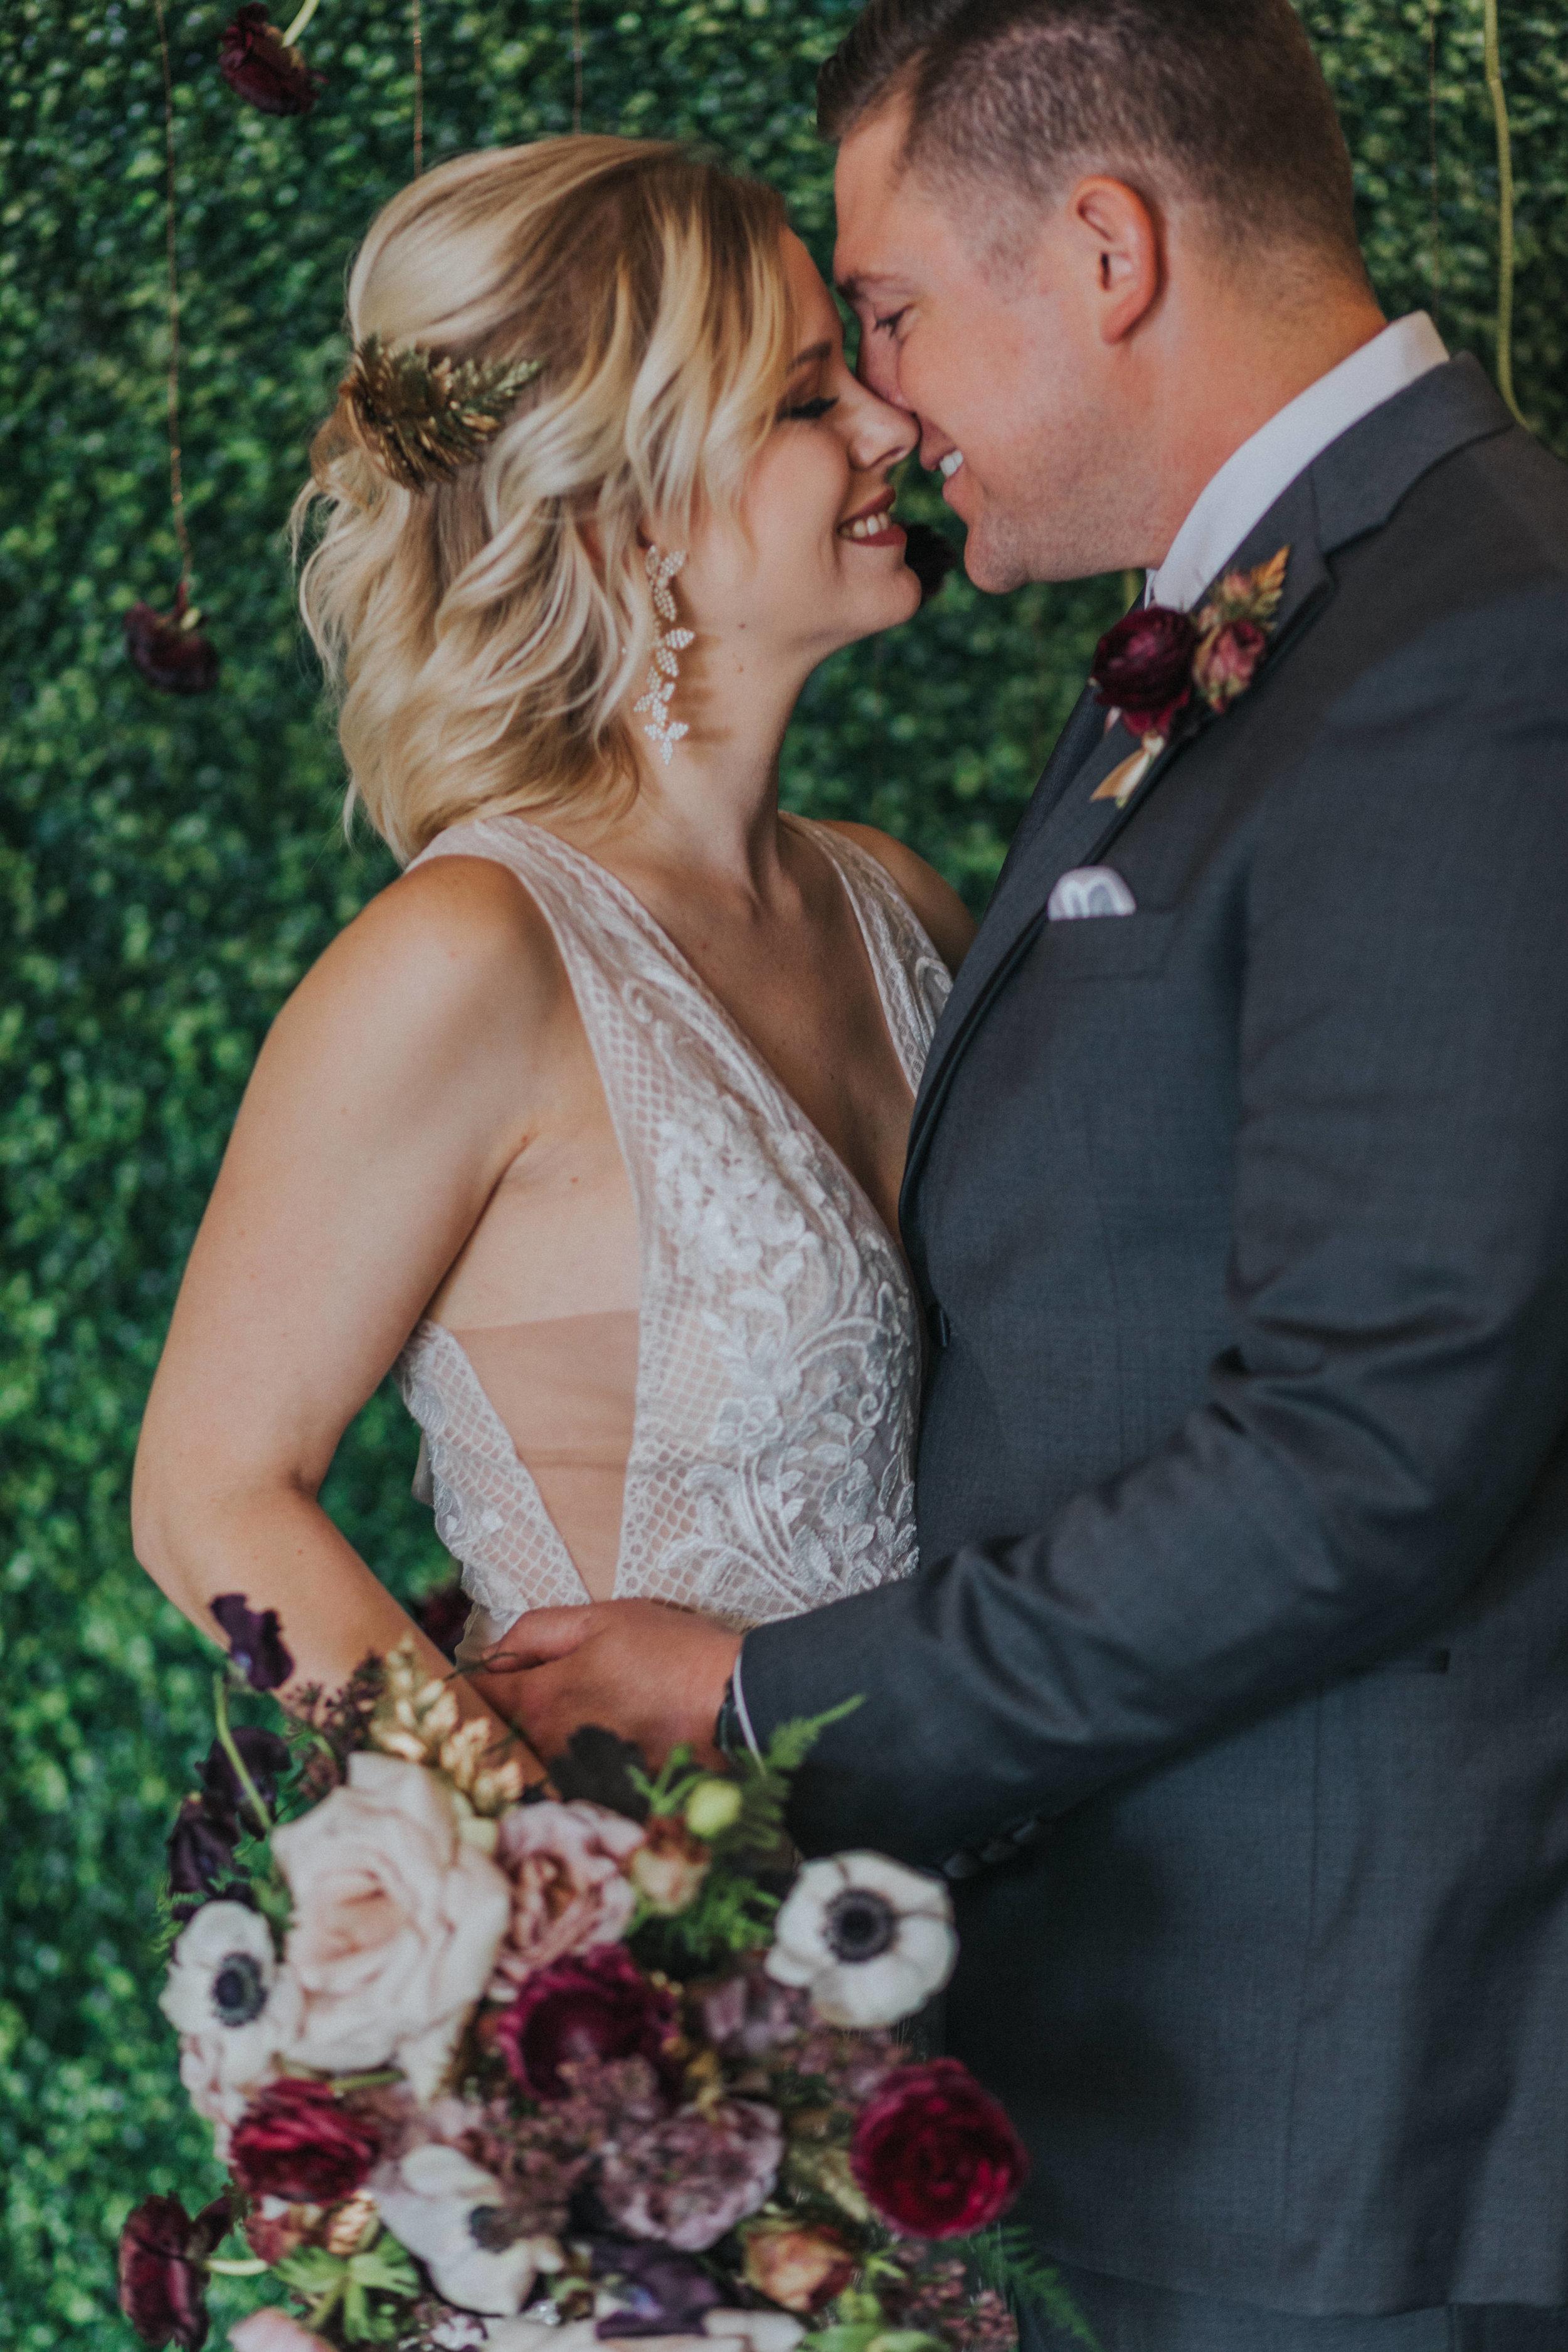 123 tiny-luxe-weddings-omaha-nebraska-midwest-empire-room.jpg